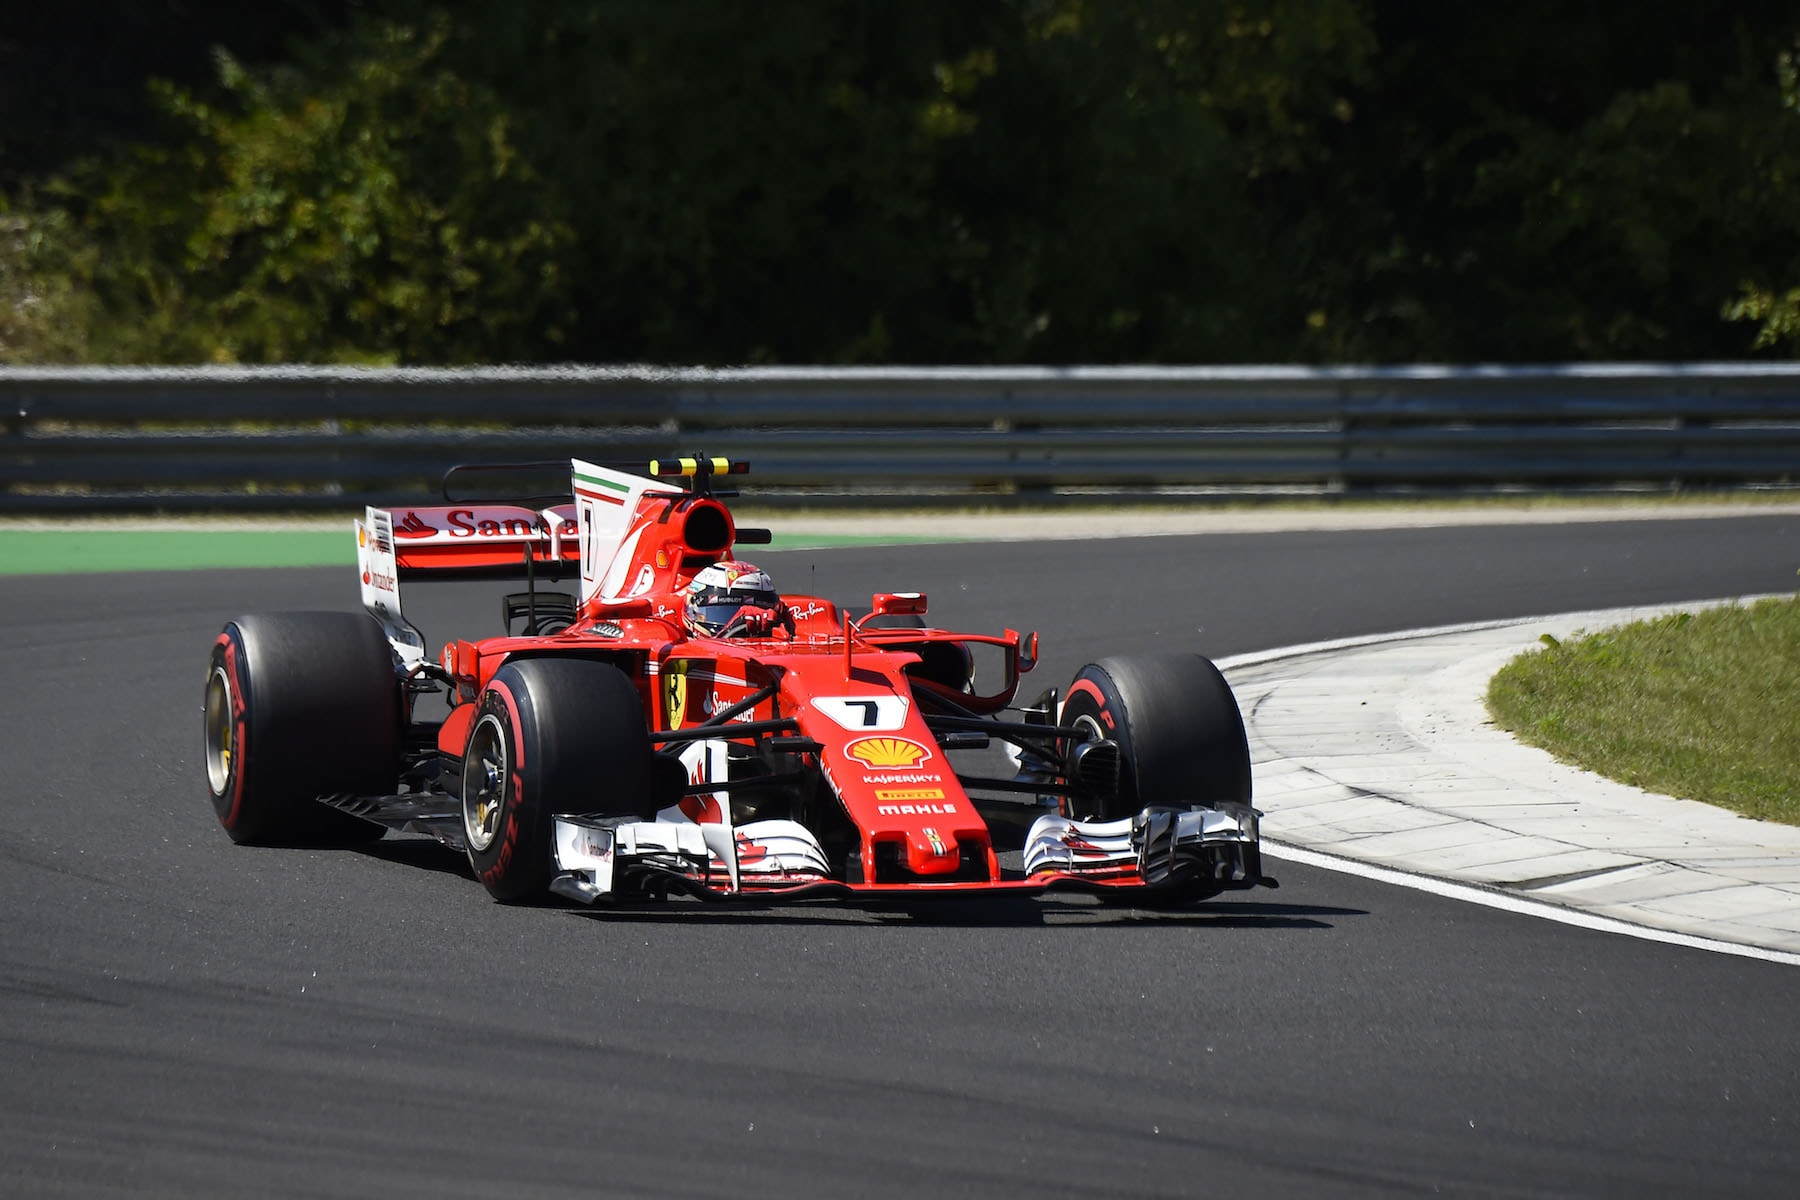 2017 Kimi Raikkonen | Ferrari SF70H | 2017 Hungarian GP Q3 P1 1 copy.jpg